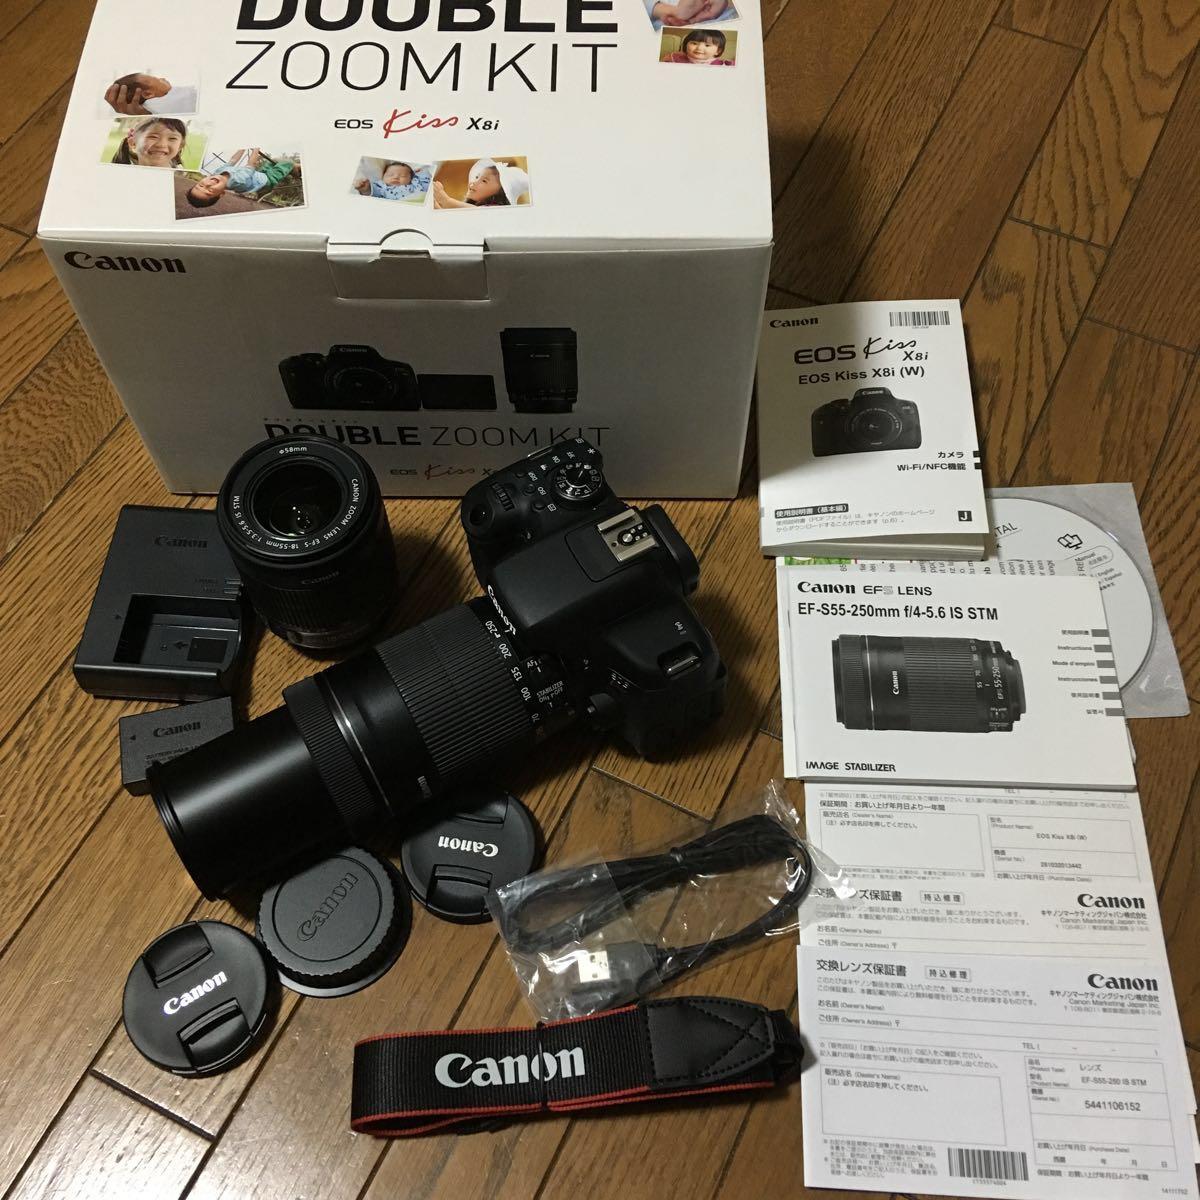 Canon EOS Kiss X8i ダブルズームキット(EF-S18-55mm F3.5-5.6 IS STM 55-250mm F4-5.6 IS STM)動作写りOK キレイ 付属品多 無記入の保証書